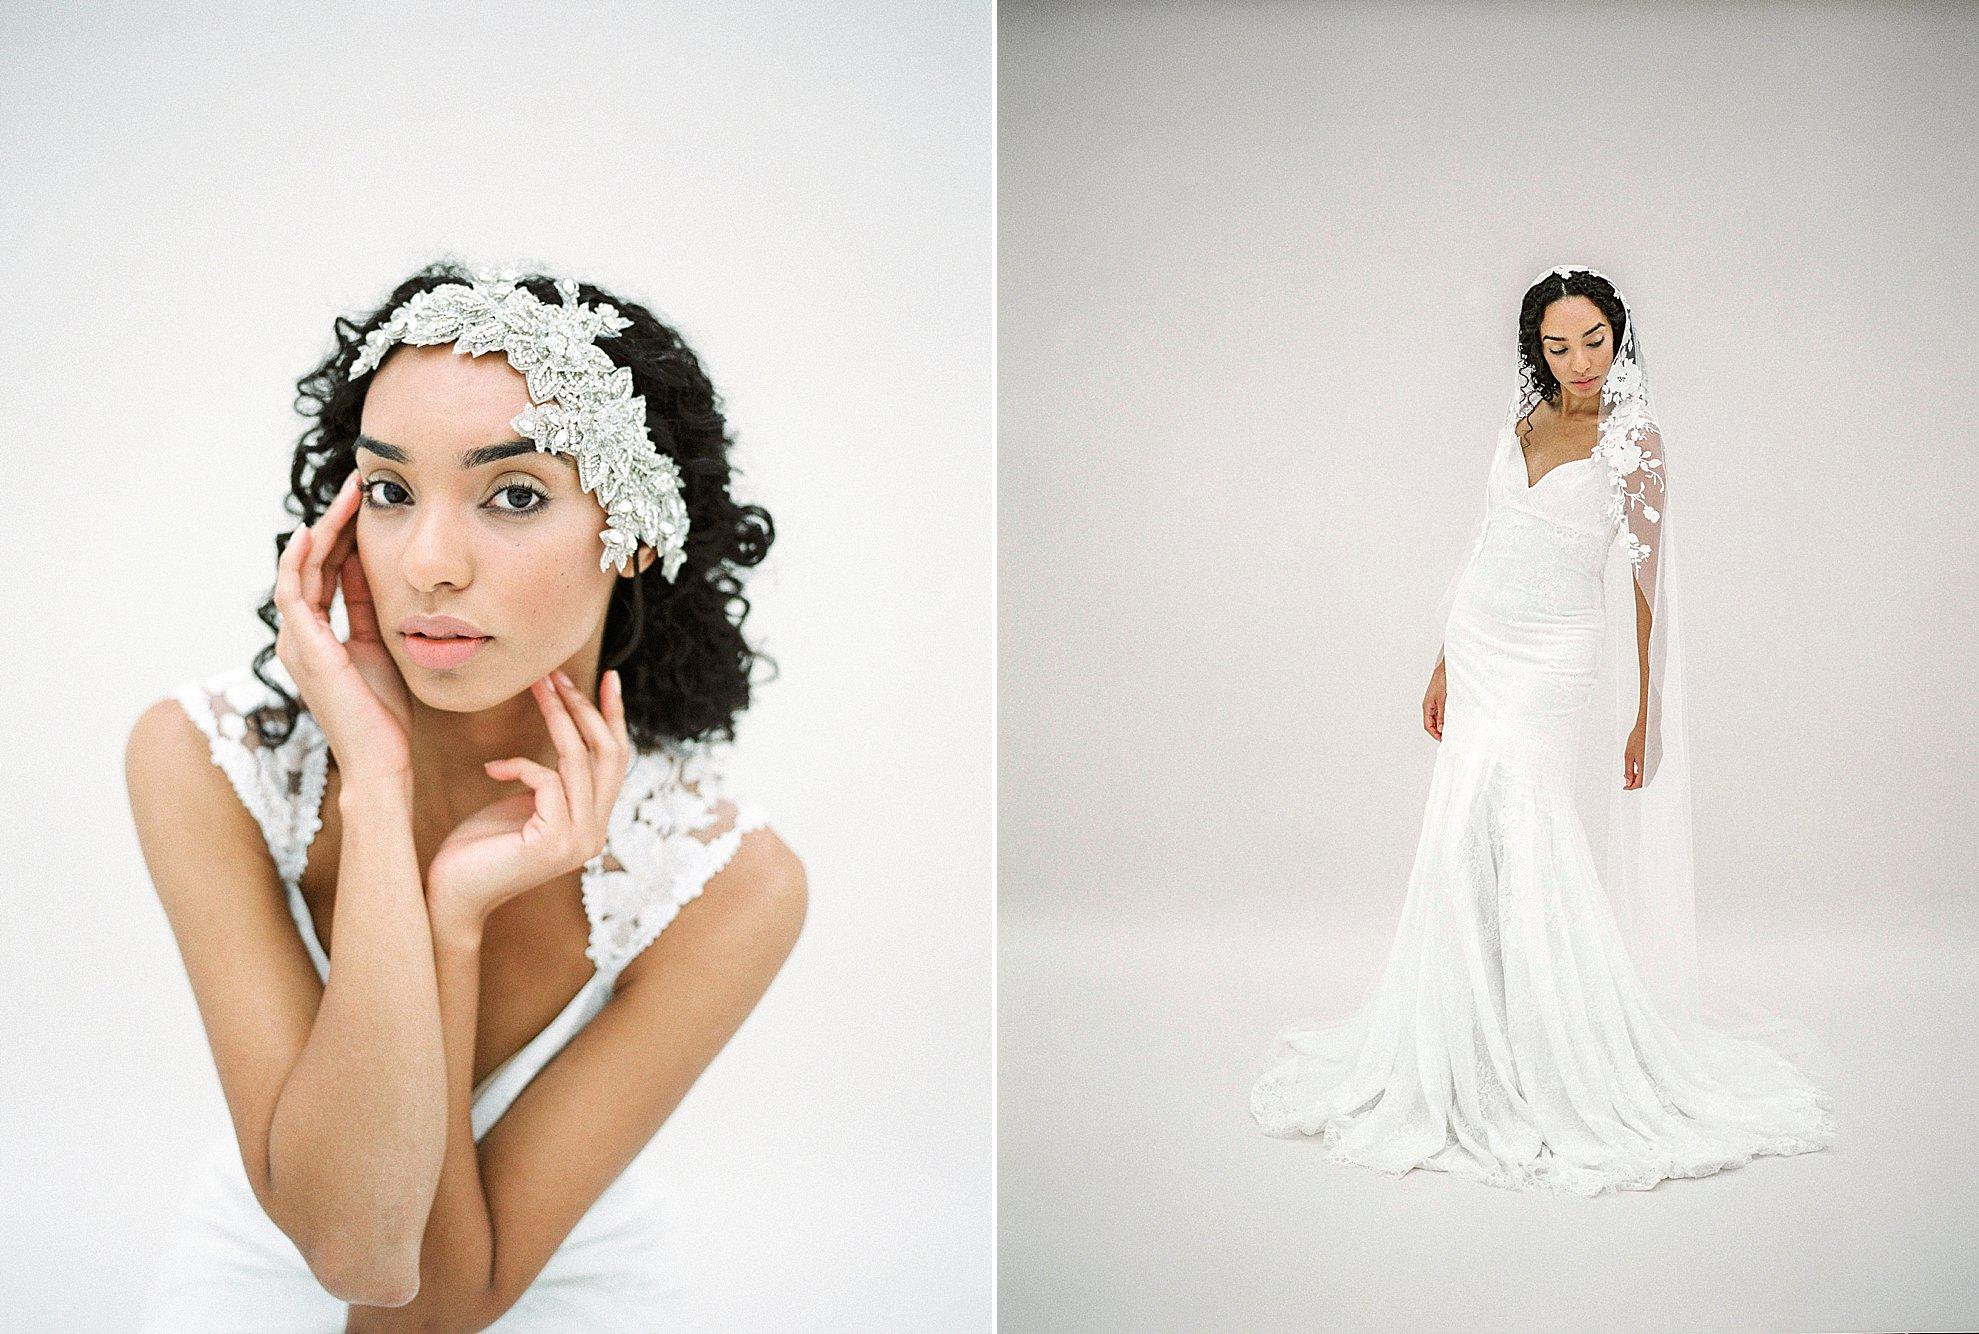 Amanda-Drost-Fotografie-mode-fashion-editorial-bridal_0002.jpg